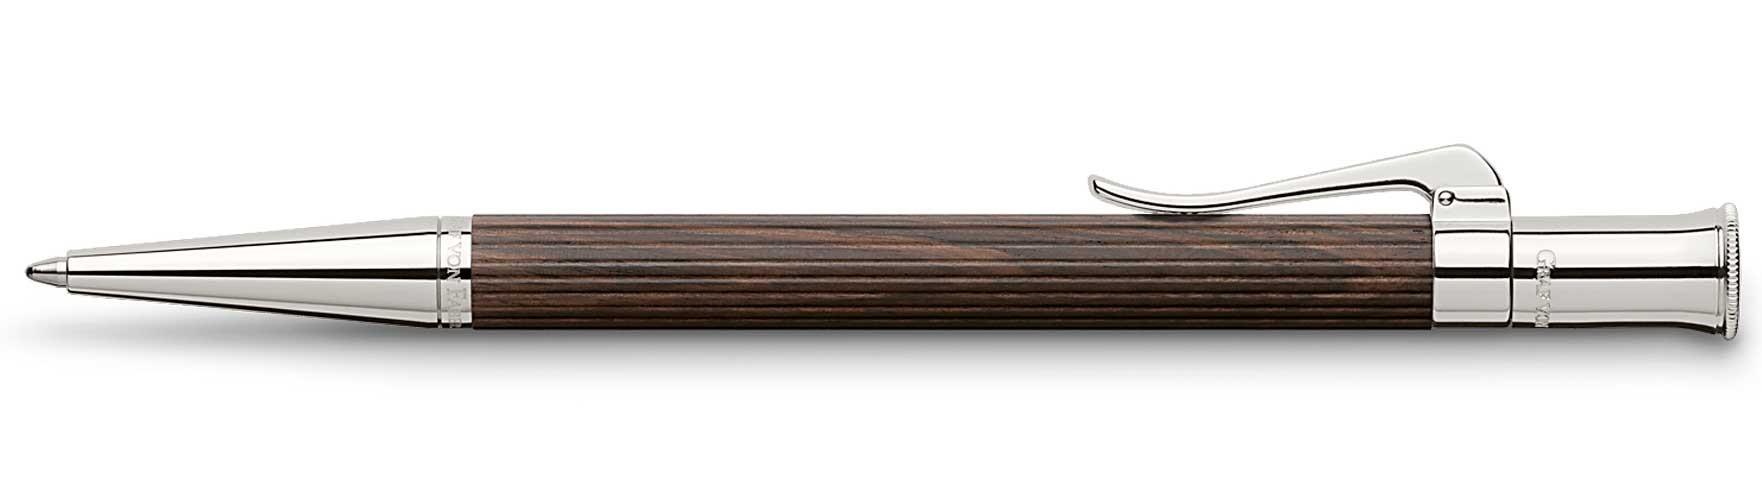 Шариковая ручка Graf von Faber-Castell Classic Grenadill